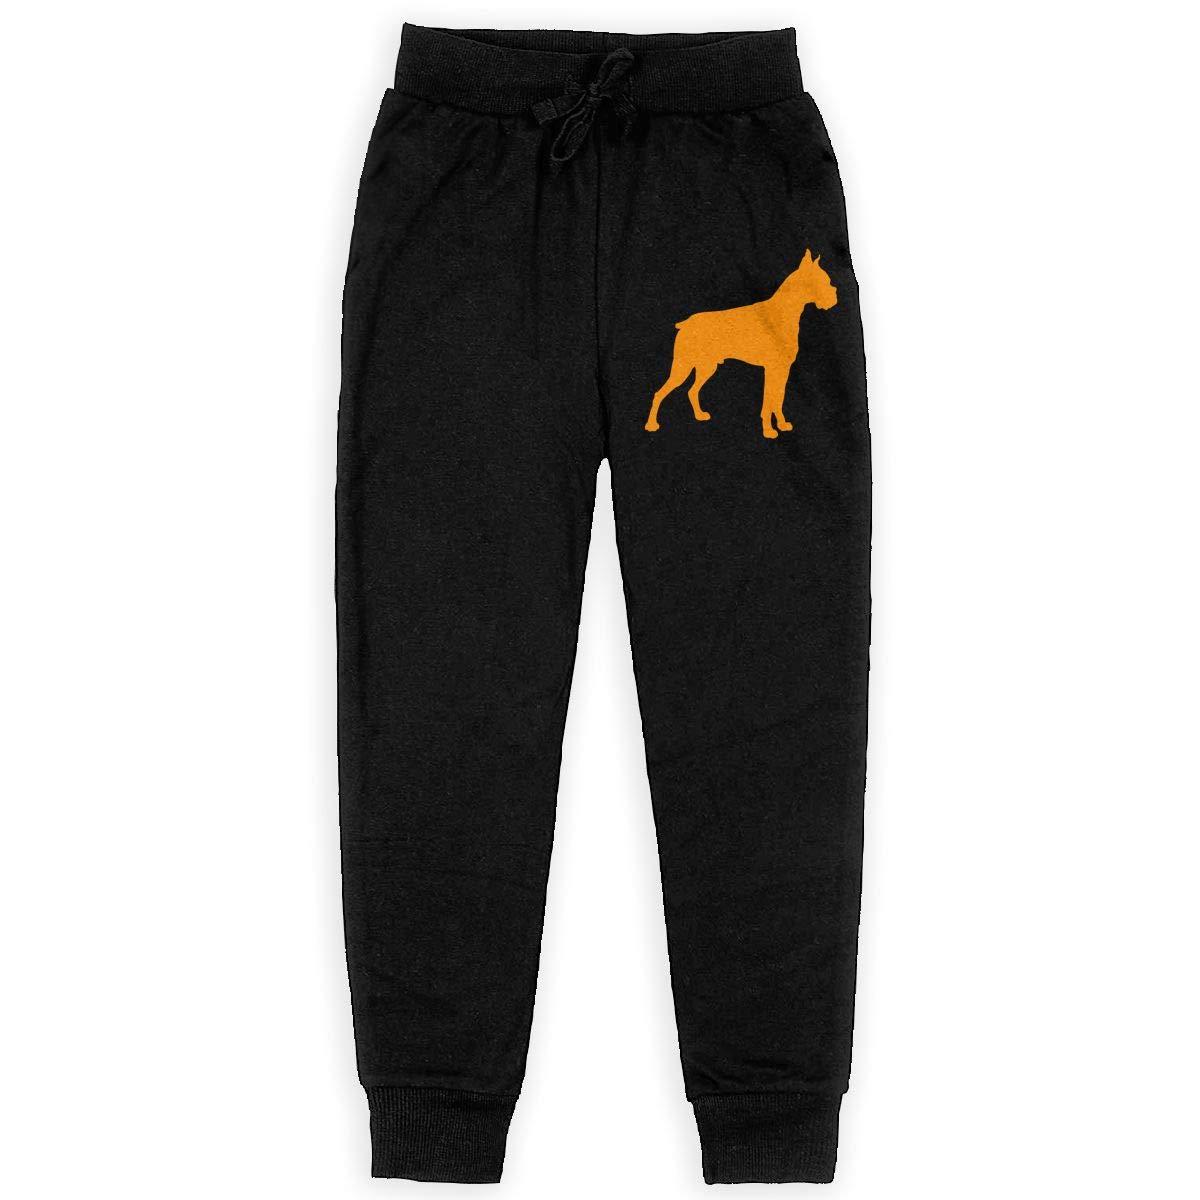 Teenager Active Pants for Teen Girls WYZVK22 Boxer Dog Soft//Cozy Sweatpants